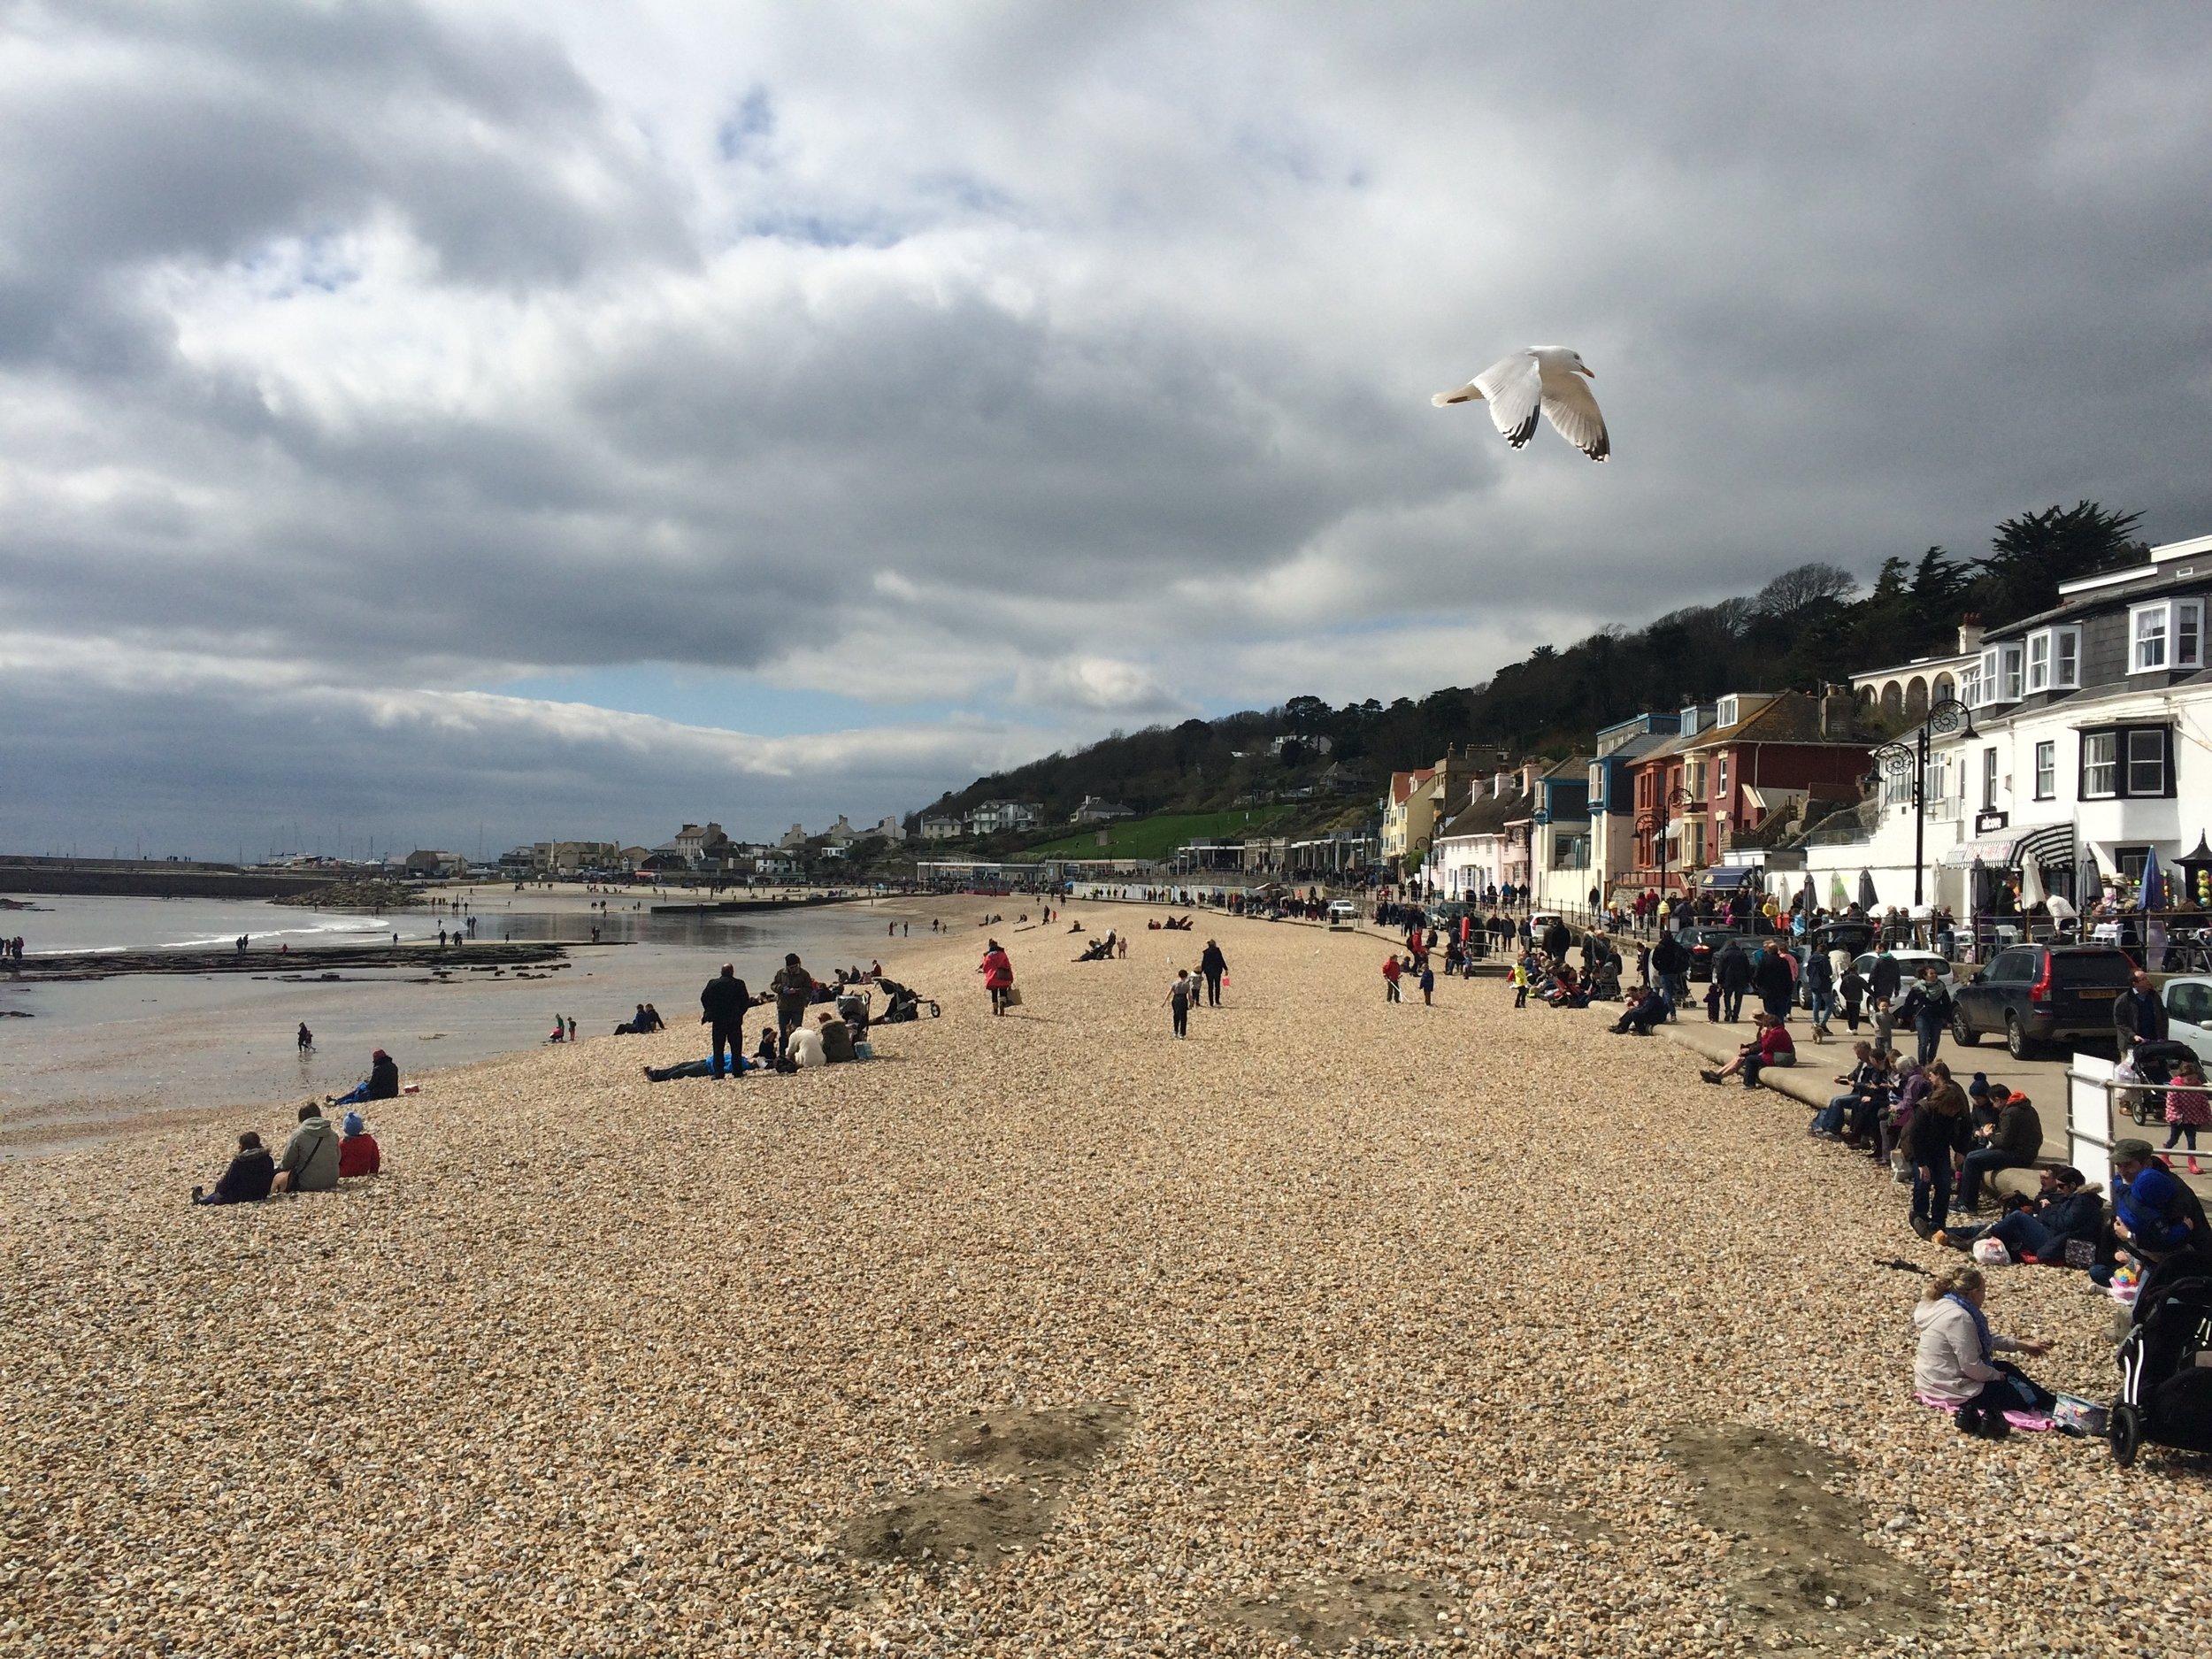 Lyme Regis Dorset, United Kingdom